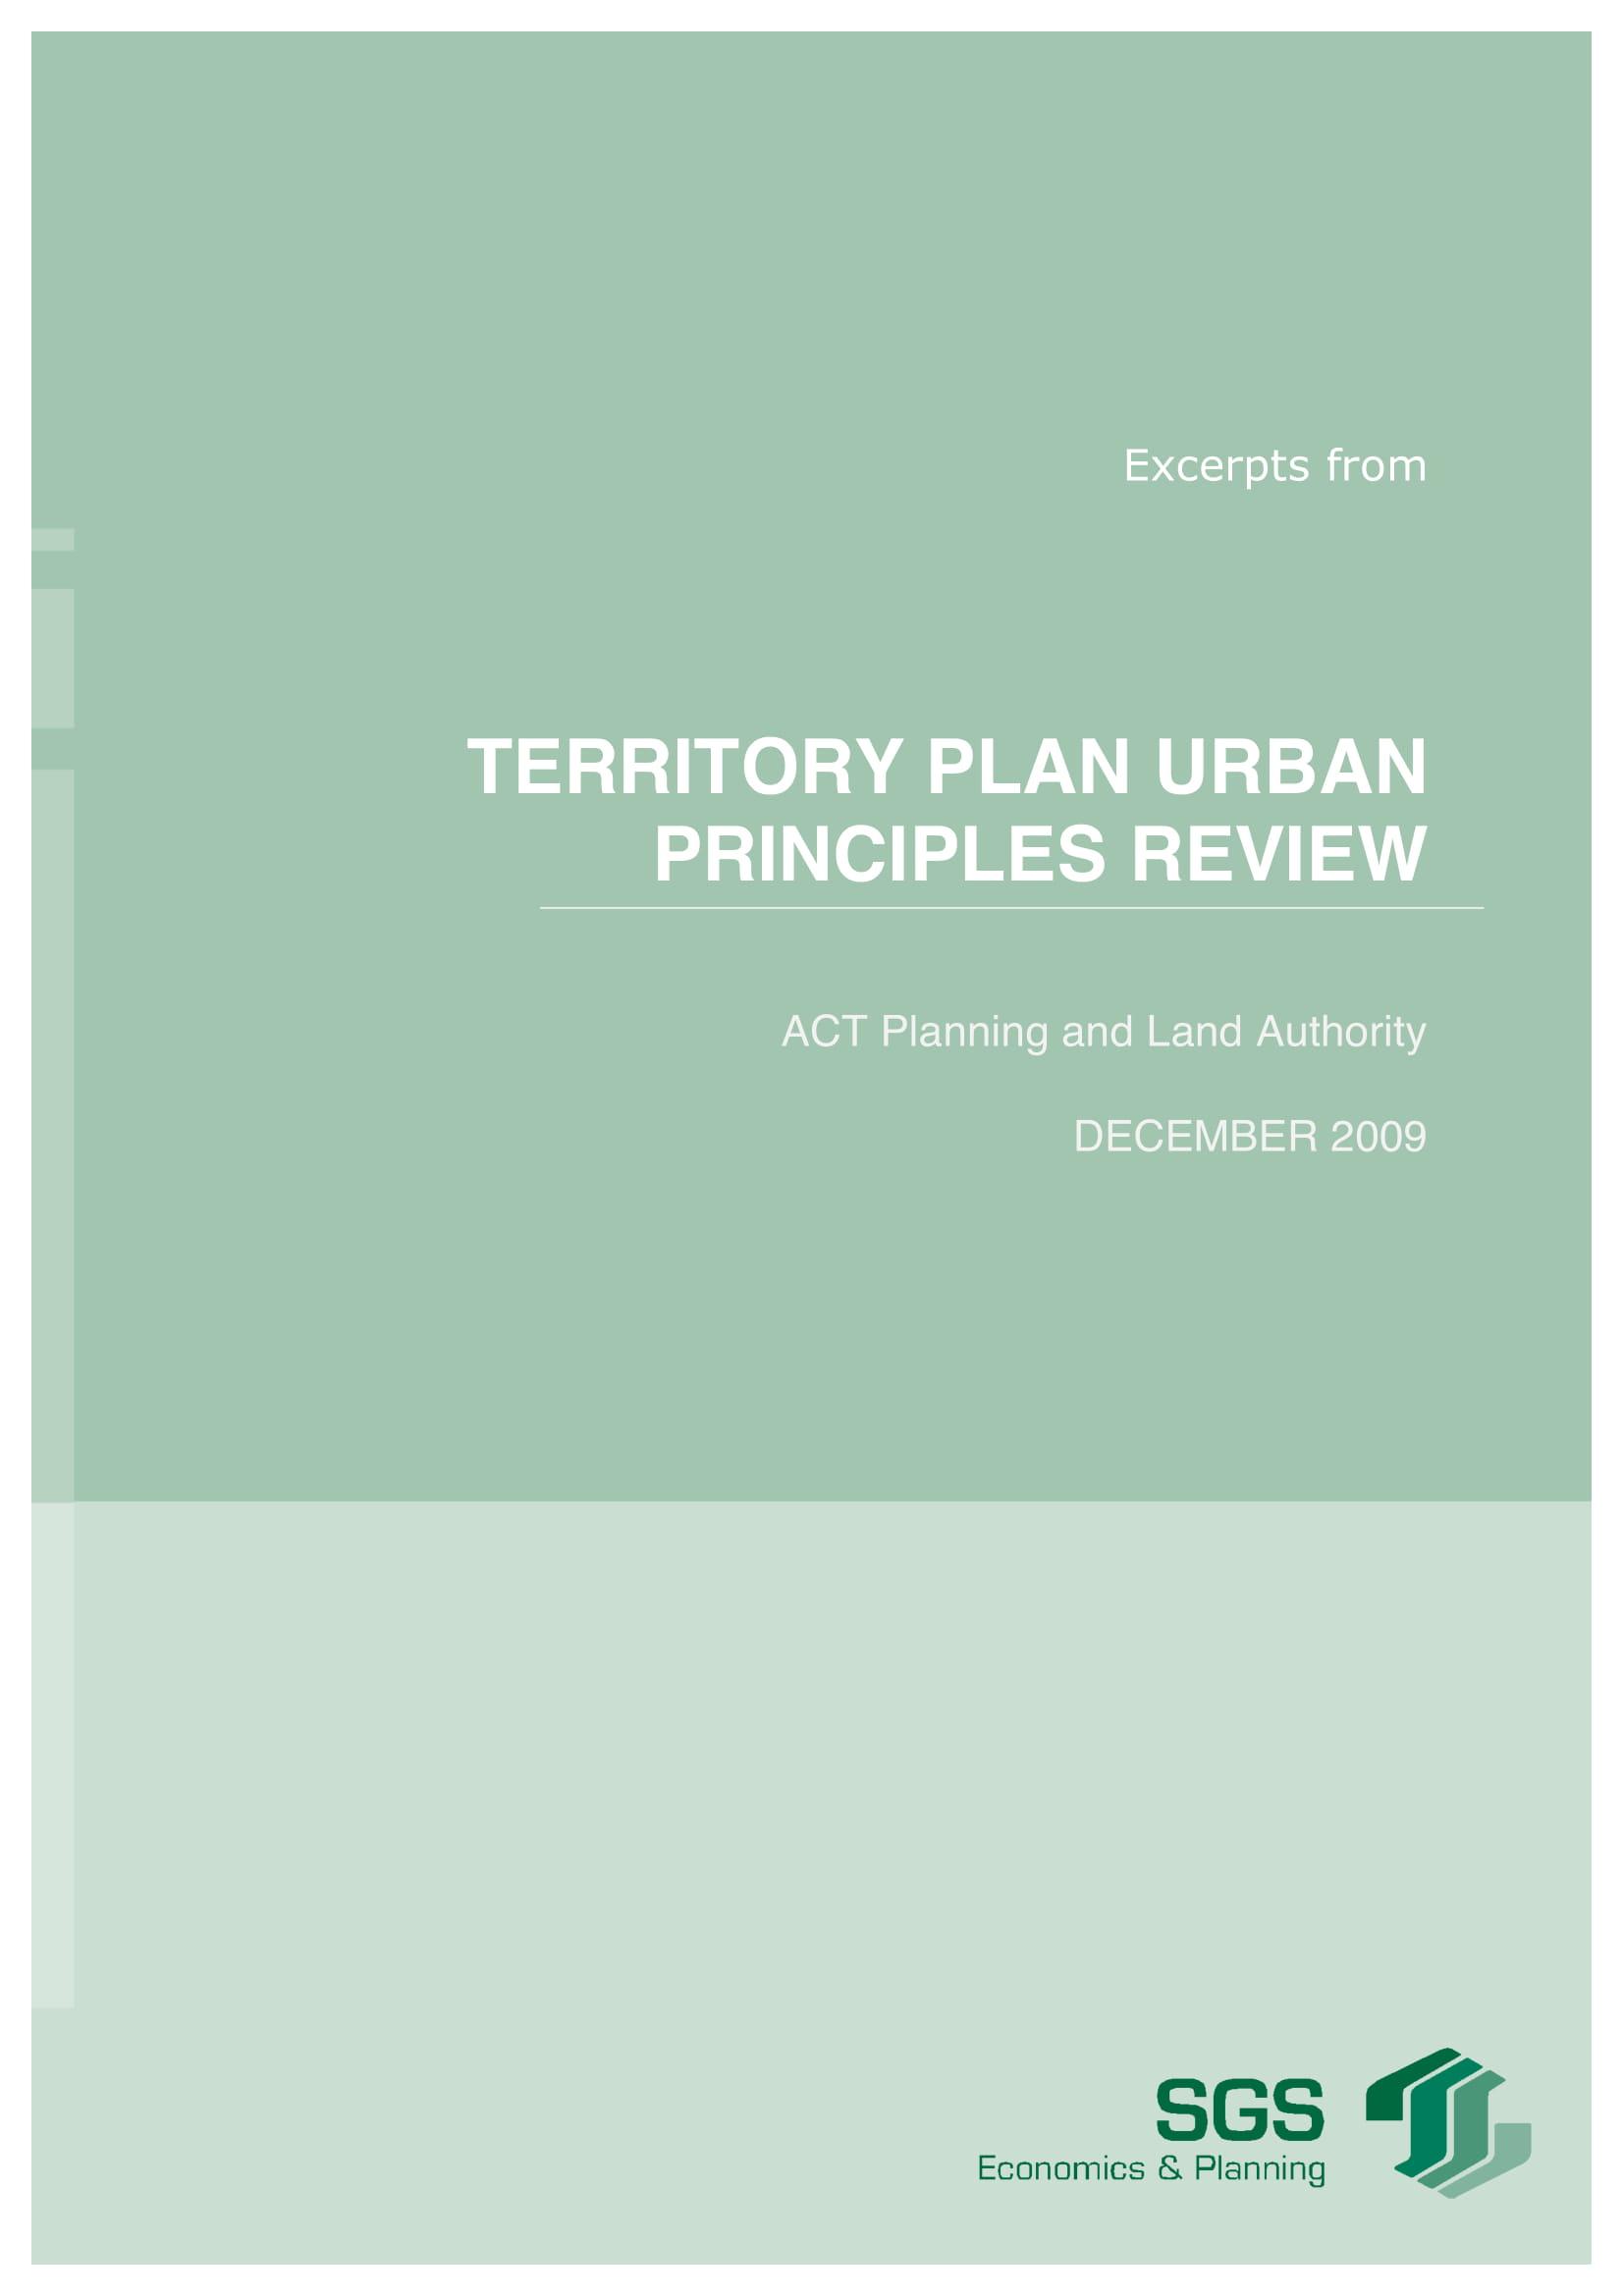 sales territory plan urban principles review example 011